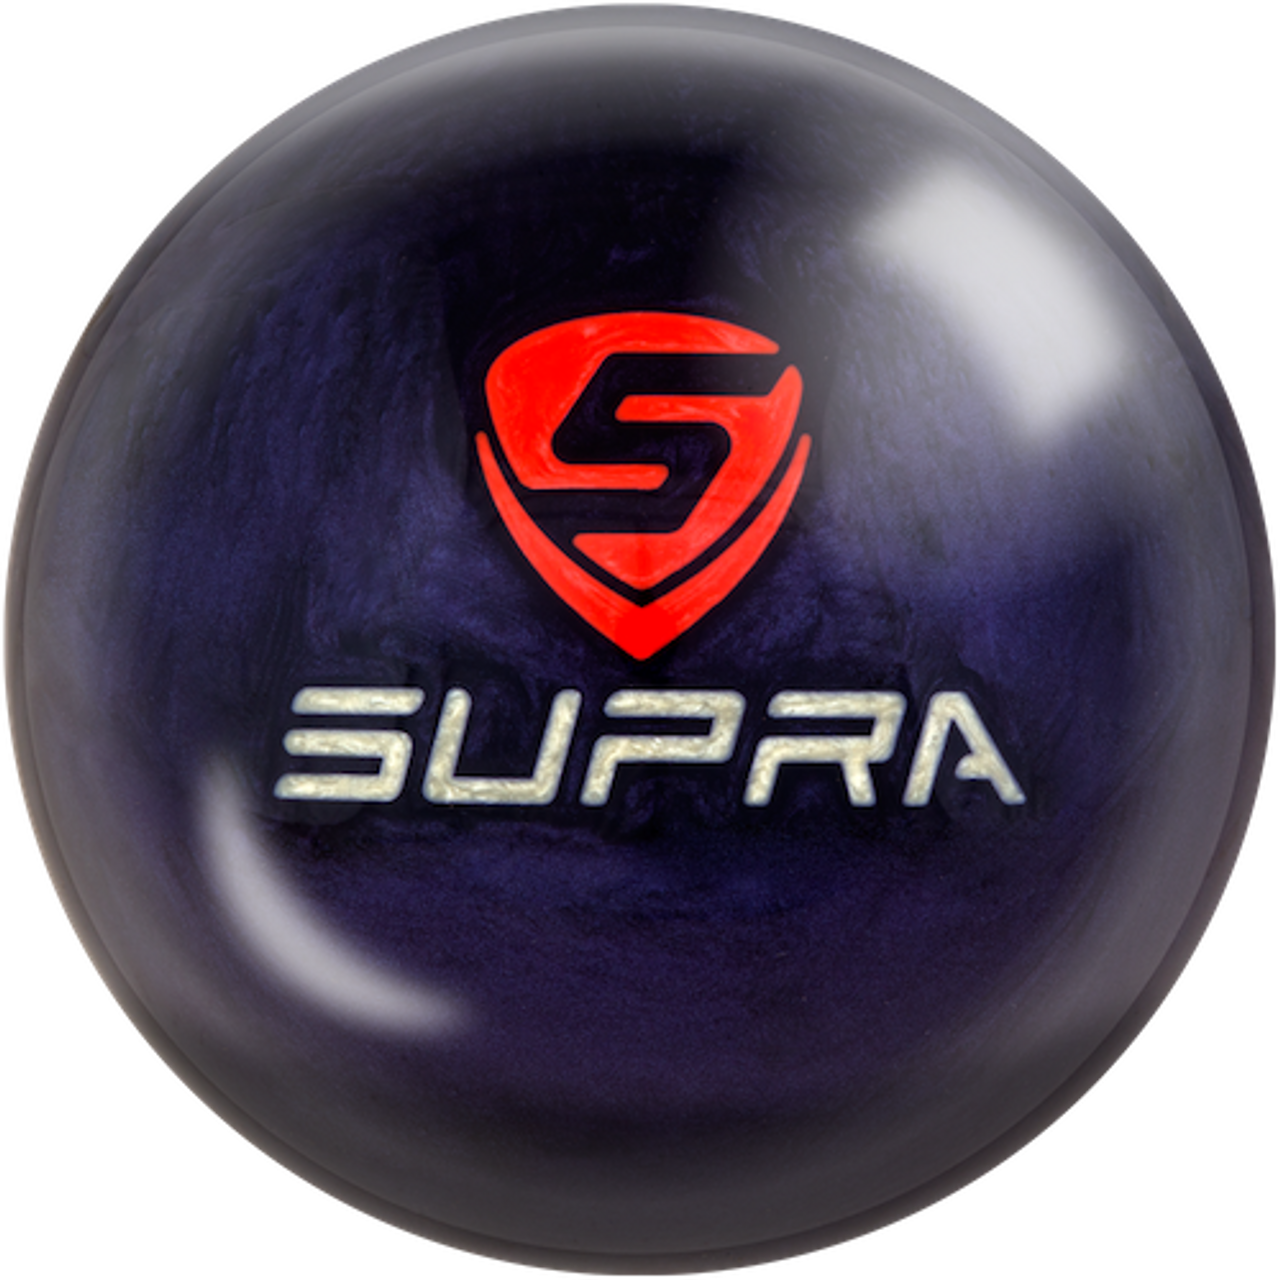 Motiv Supra Bowling Ball